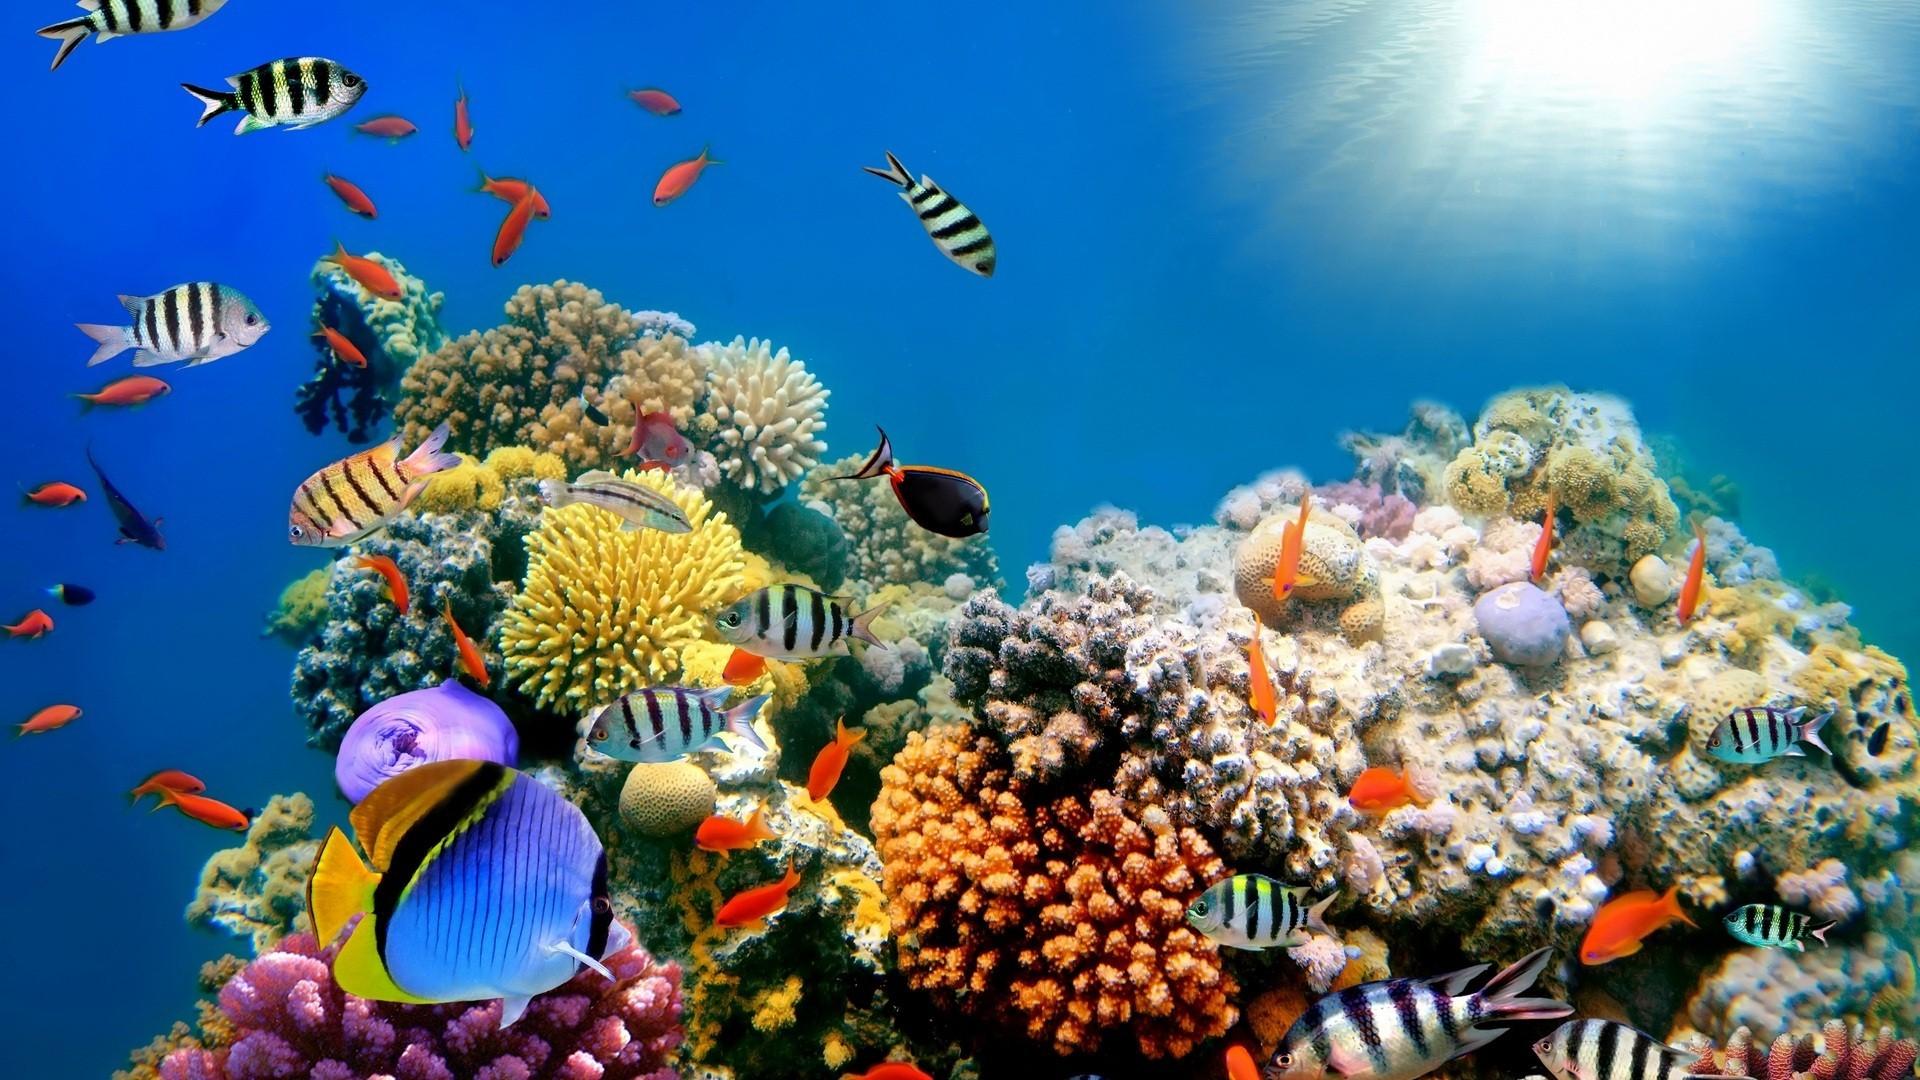 Desktop hd fish tank moving wallpaper